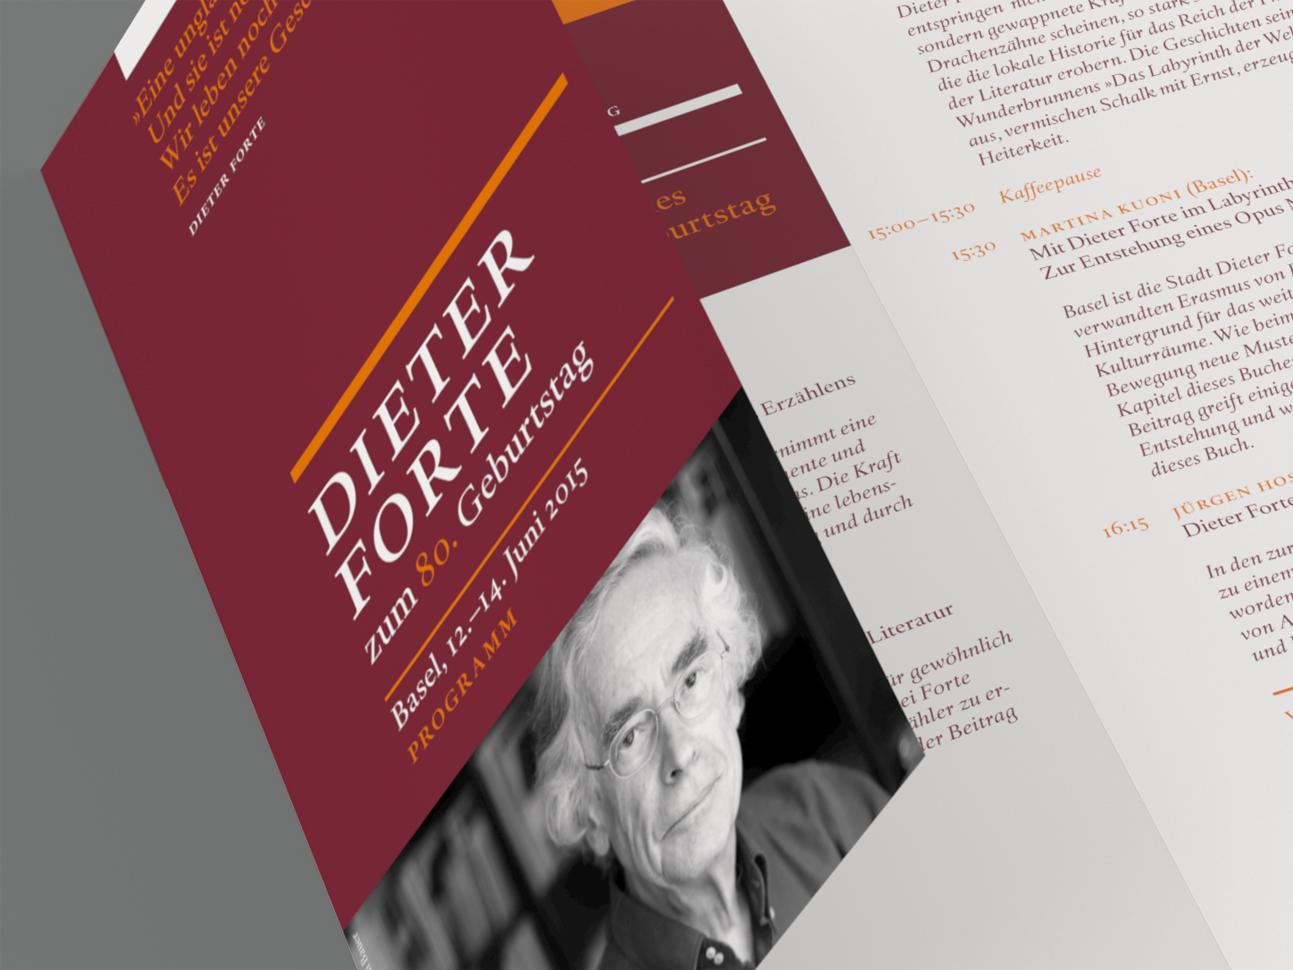 martin_zech_design_projekt_design_dieter_forte_programm_detail